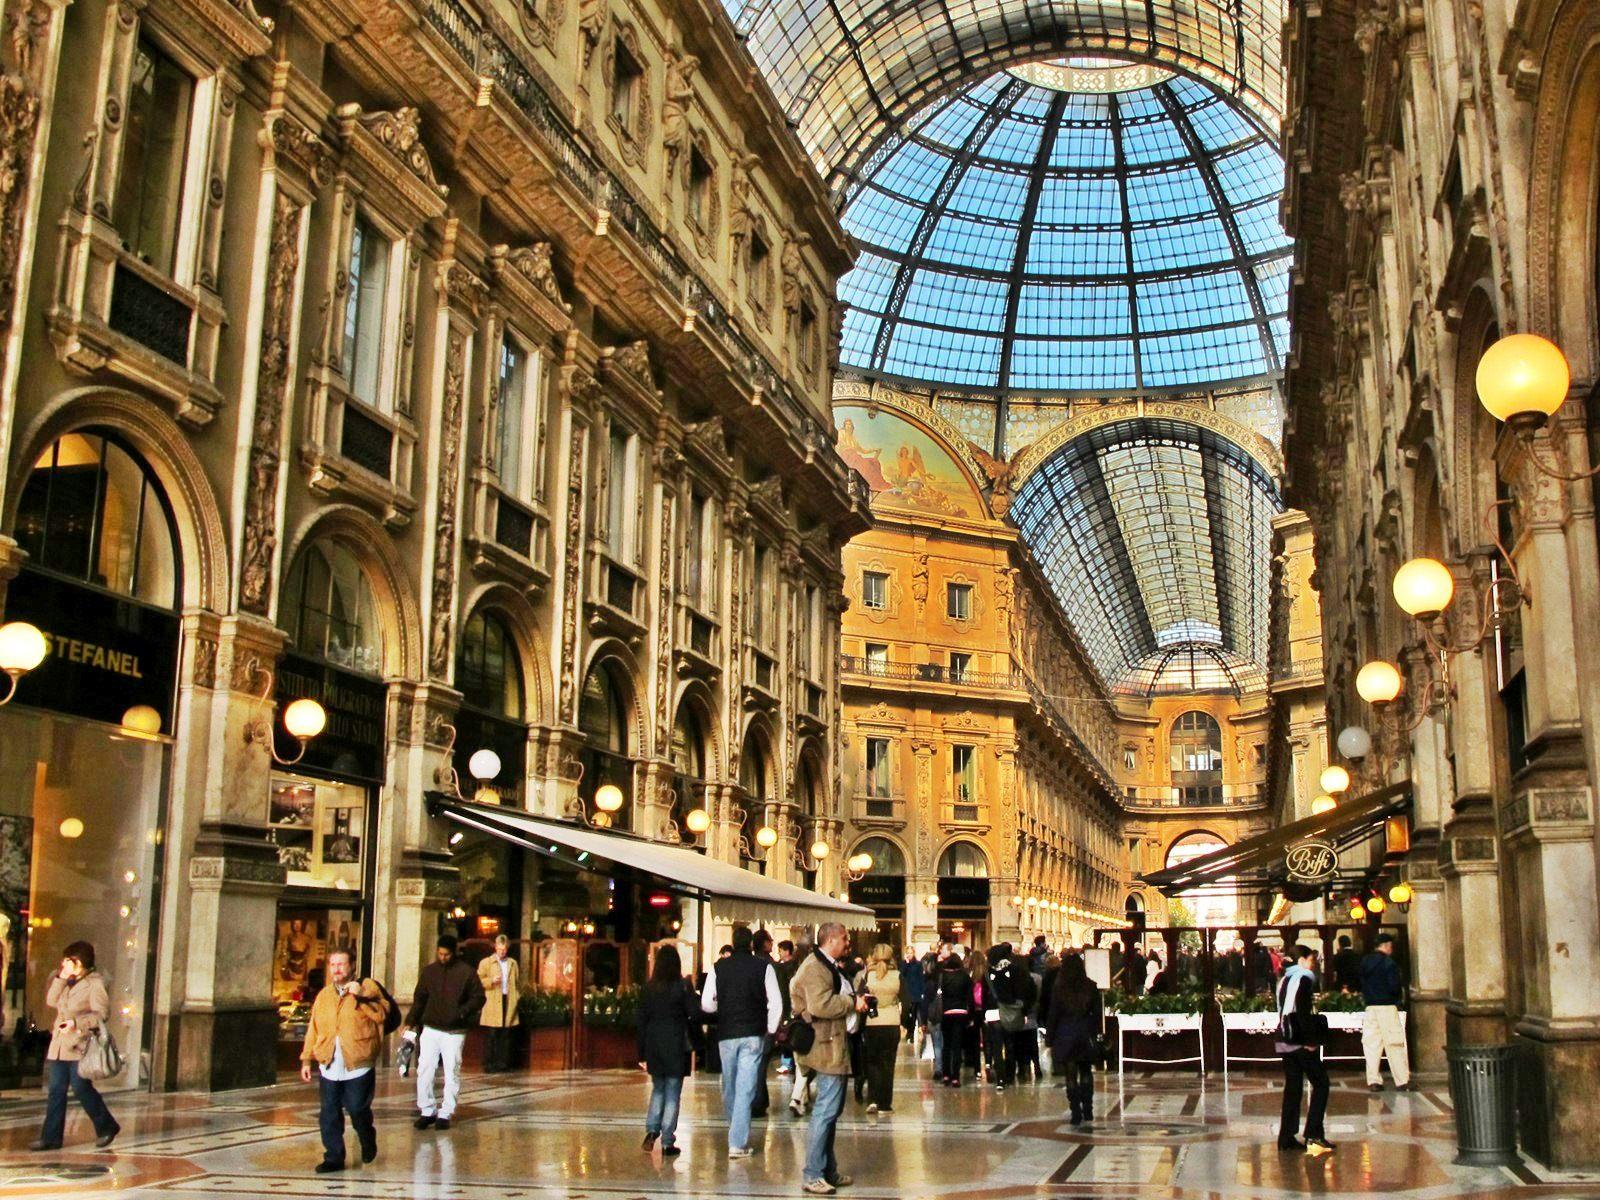 32+] Milano Wallpapers on WallpaperSafari